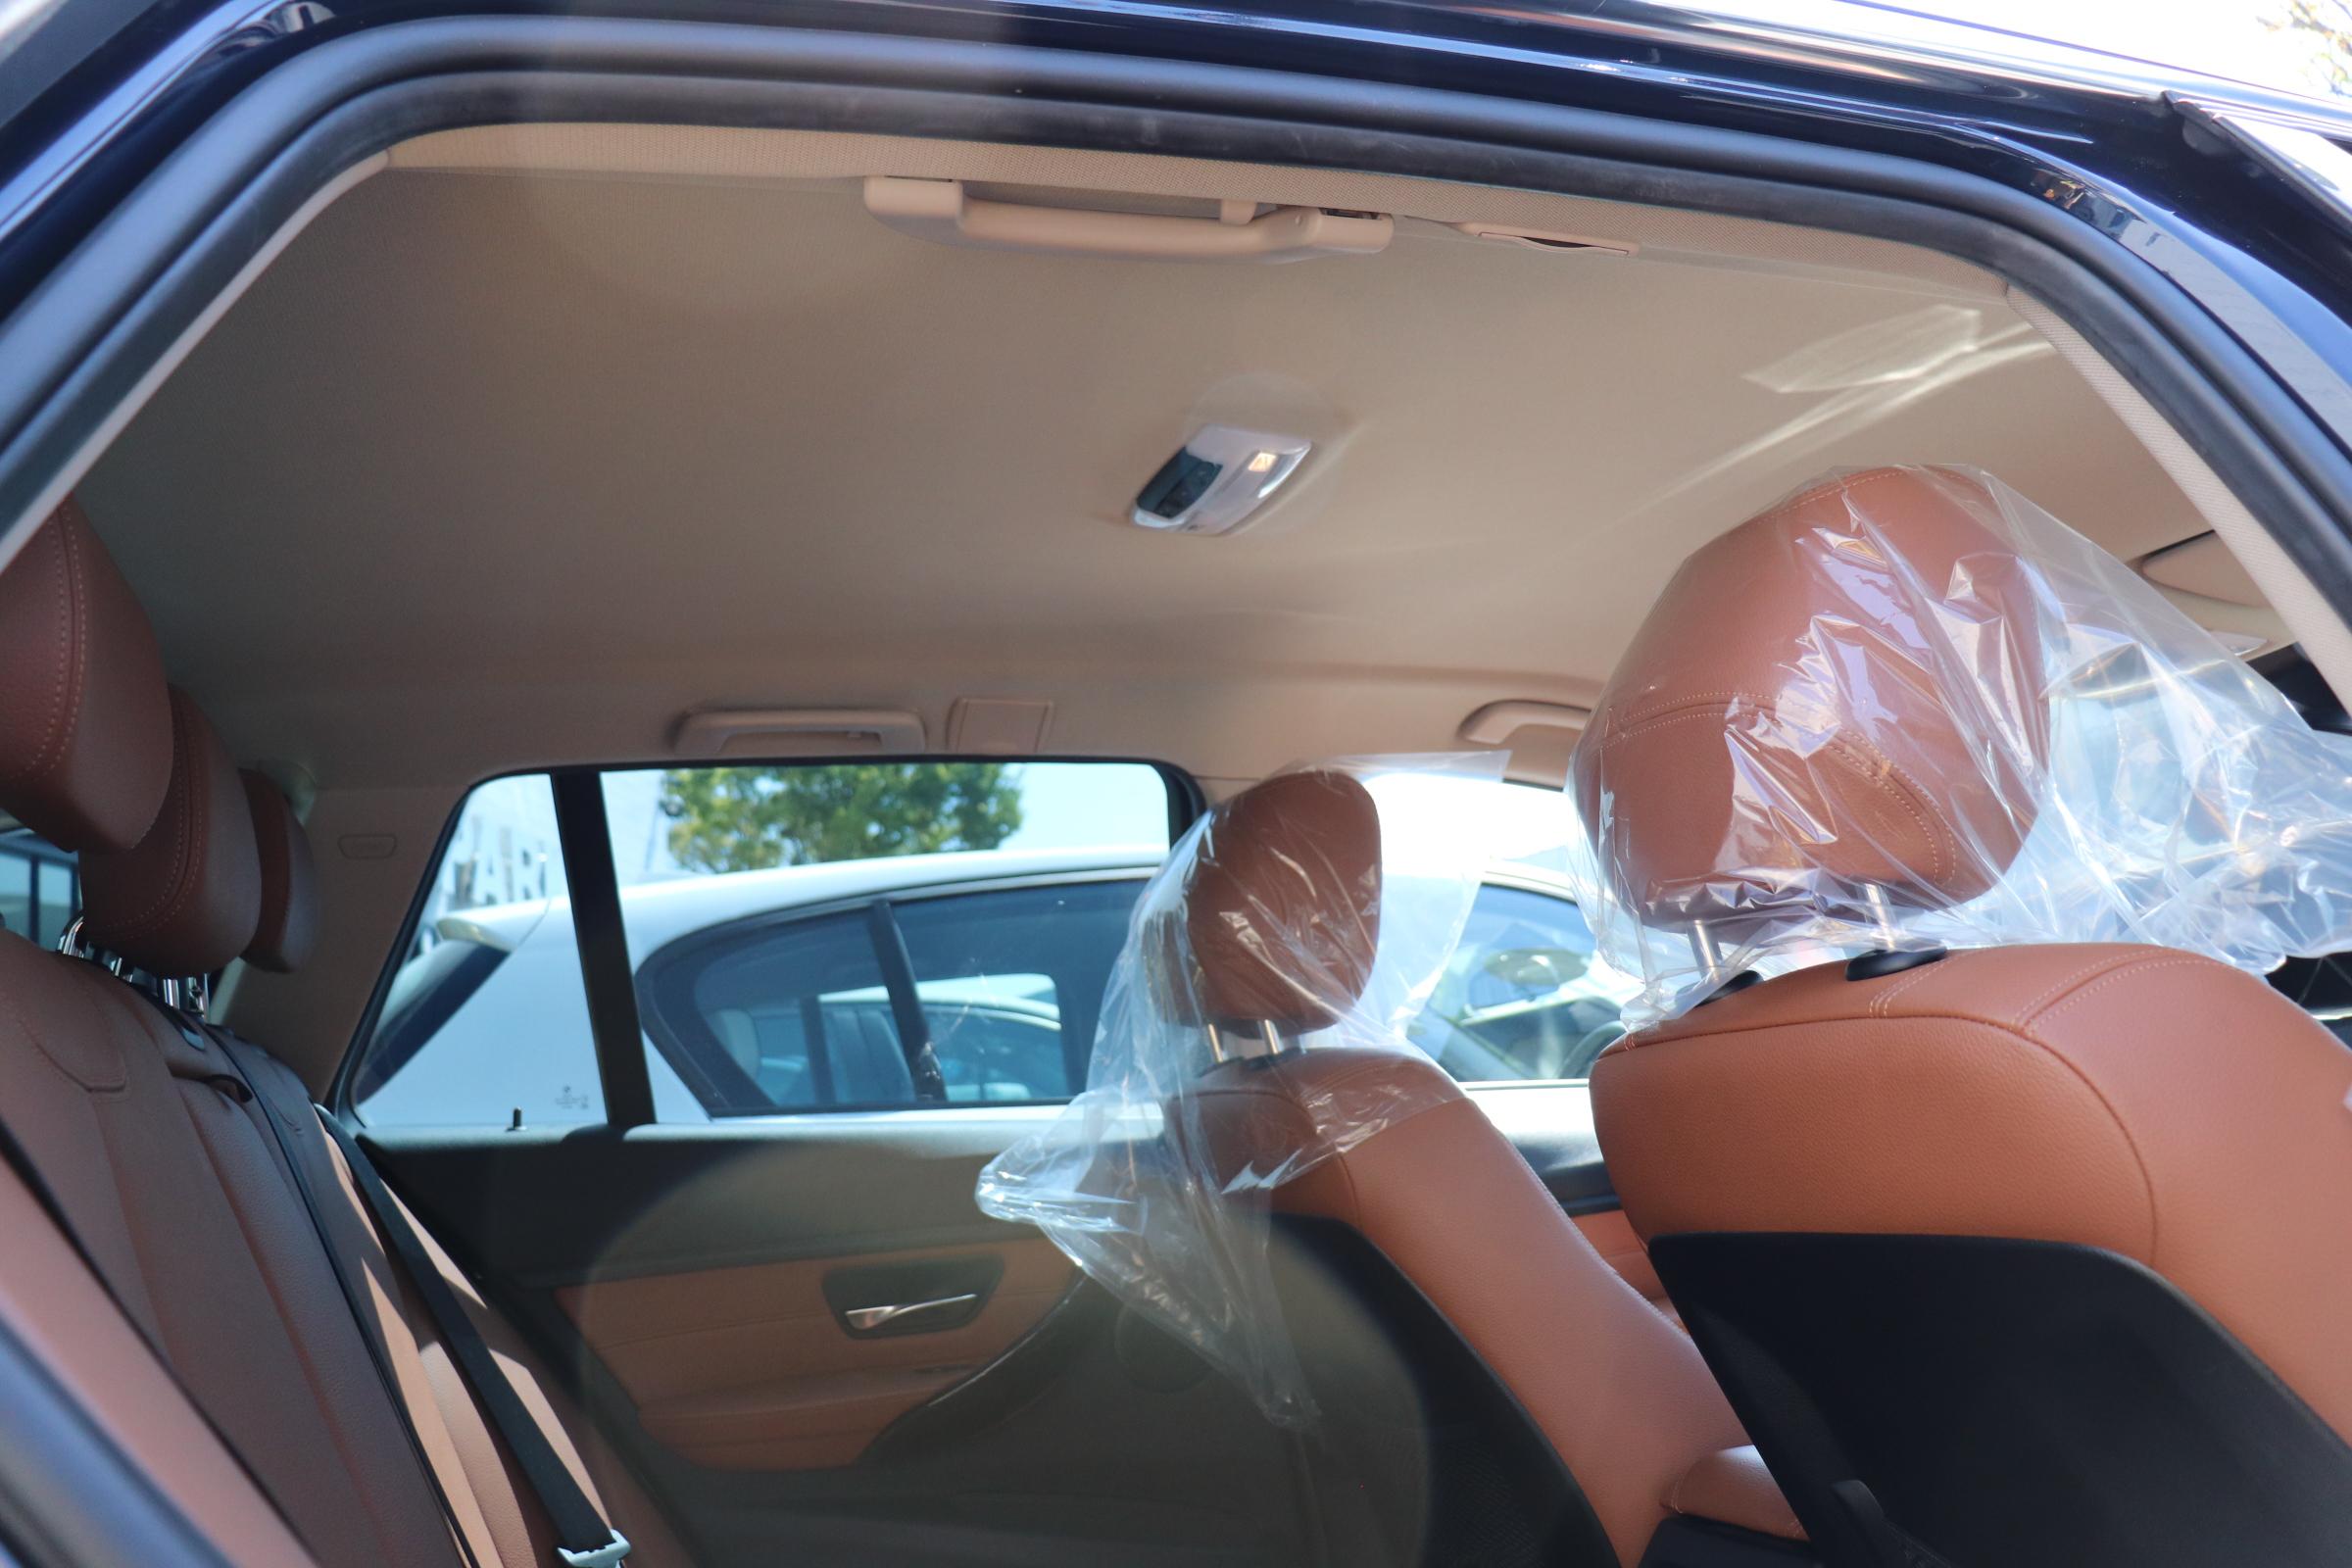 320iツーリング ラグジュアリー BEAMコンプリートカー ACC ブラウンレザーシート車両画像13